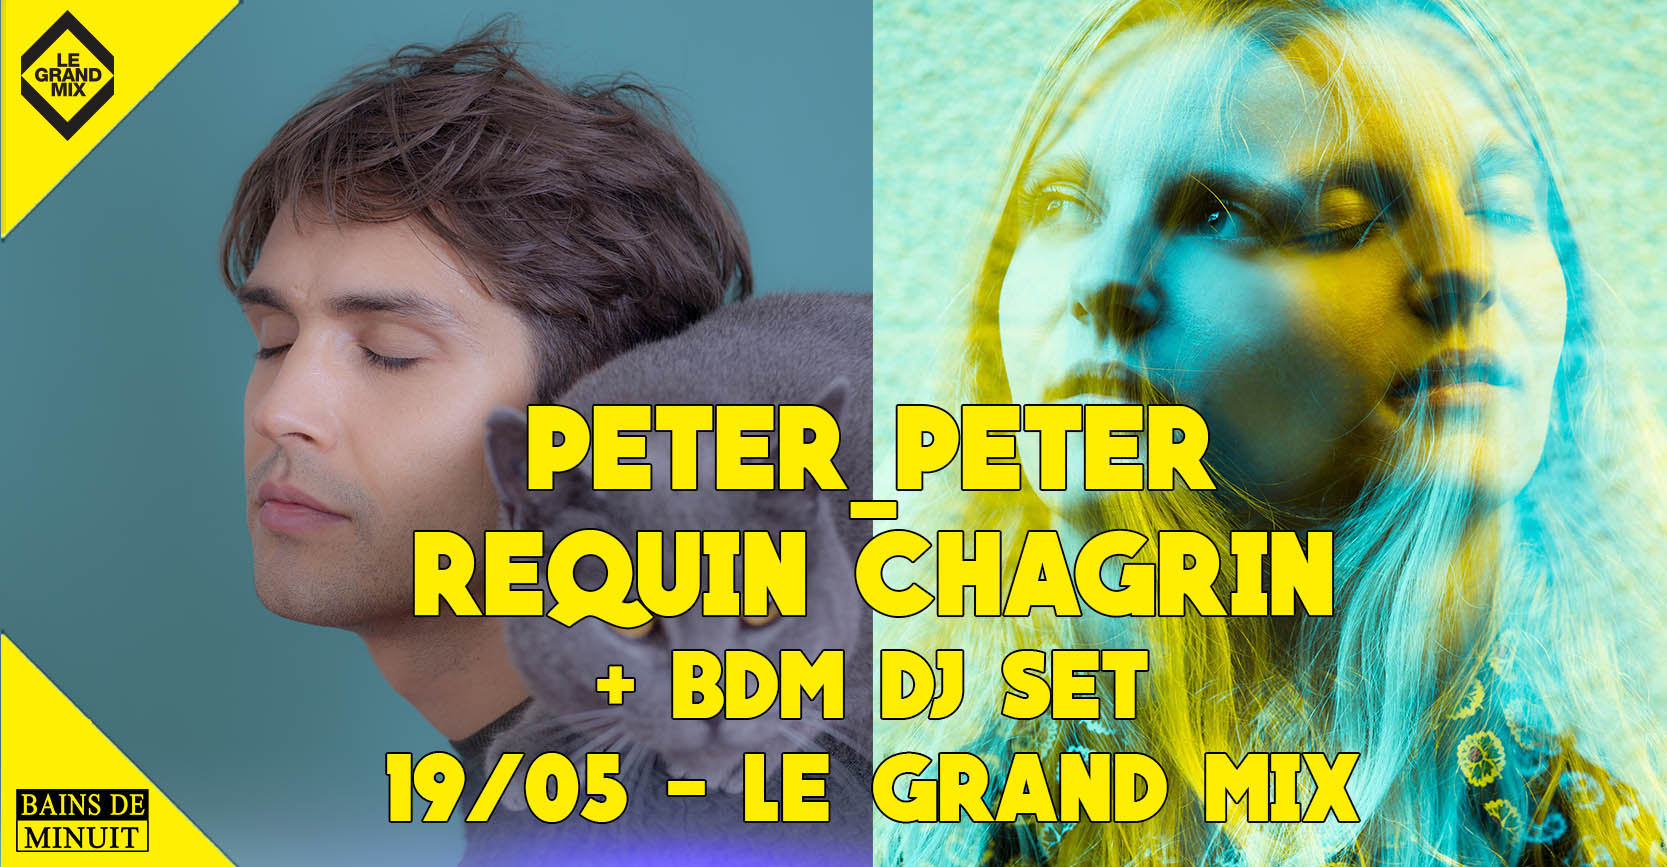 19/05 – PETER PETER (ca) + REQUIN CHAGRIN (fr) et BDM dj set / Le Grand Mix, Tourcoing